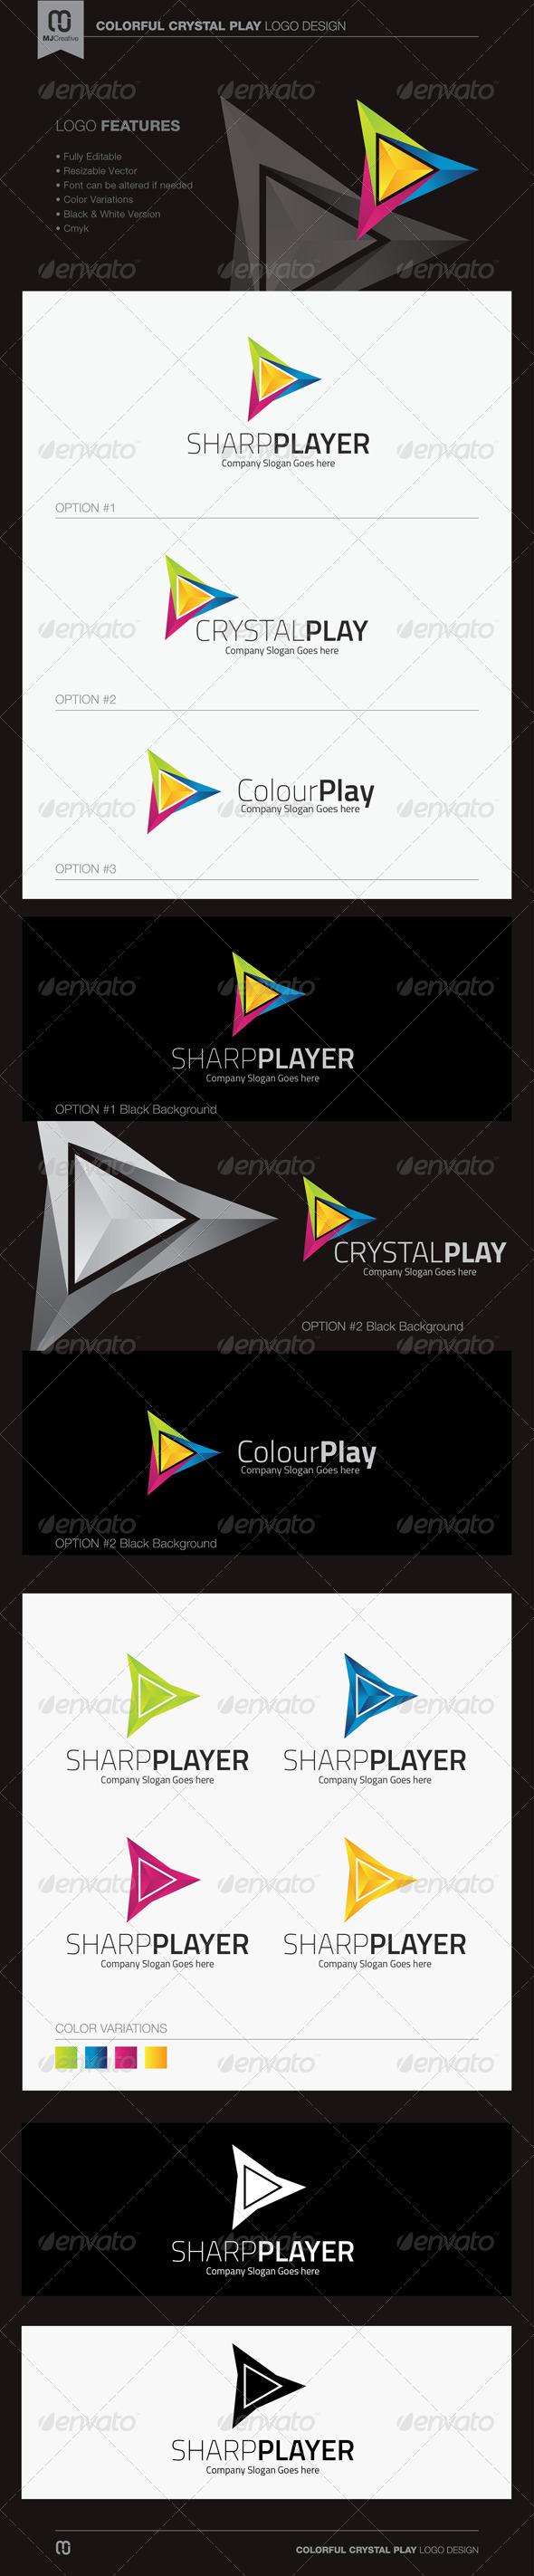 Colorful Crystal Play Logo